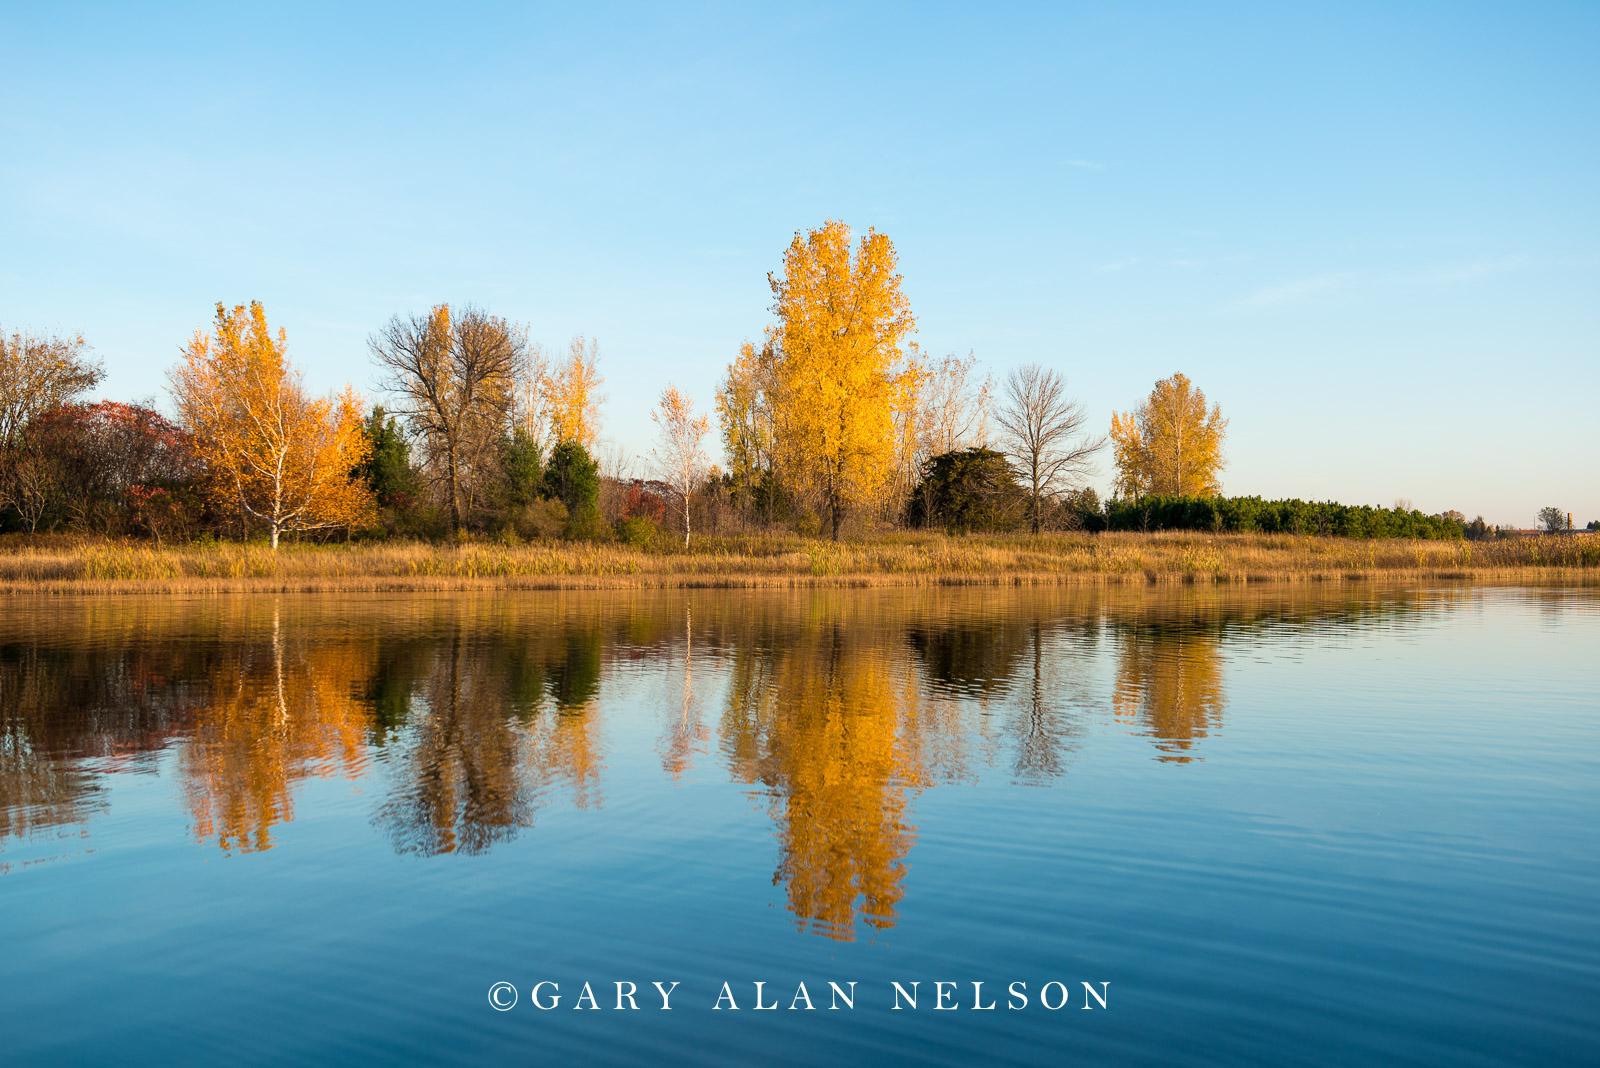 Autumn reflections in North Center Lake, Allemansratt Park, Lindstrom, Minnesota